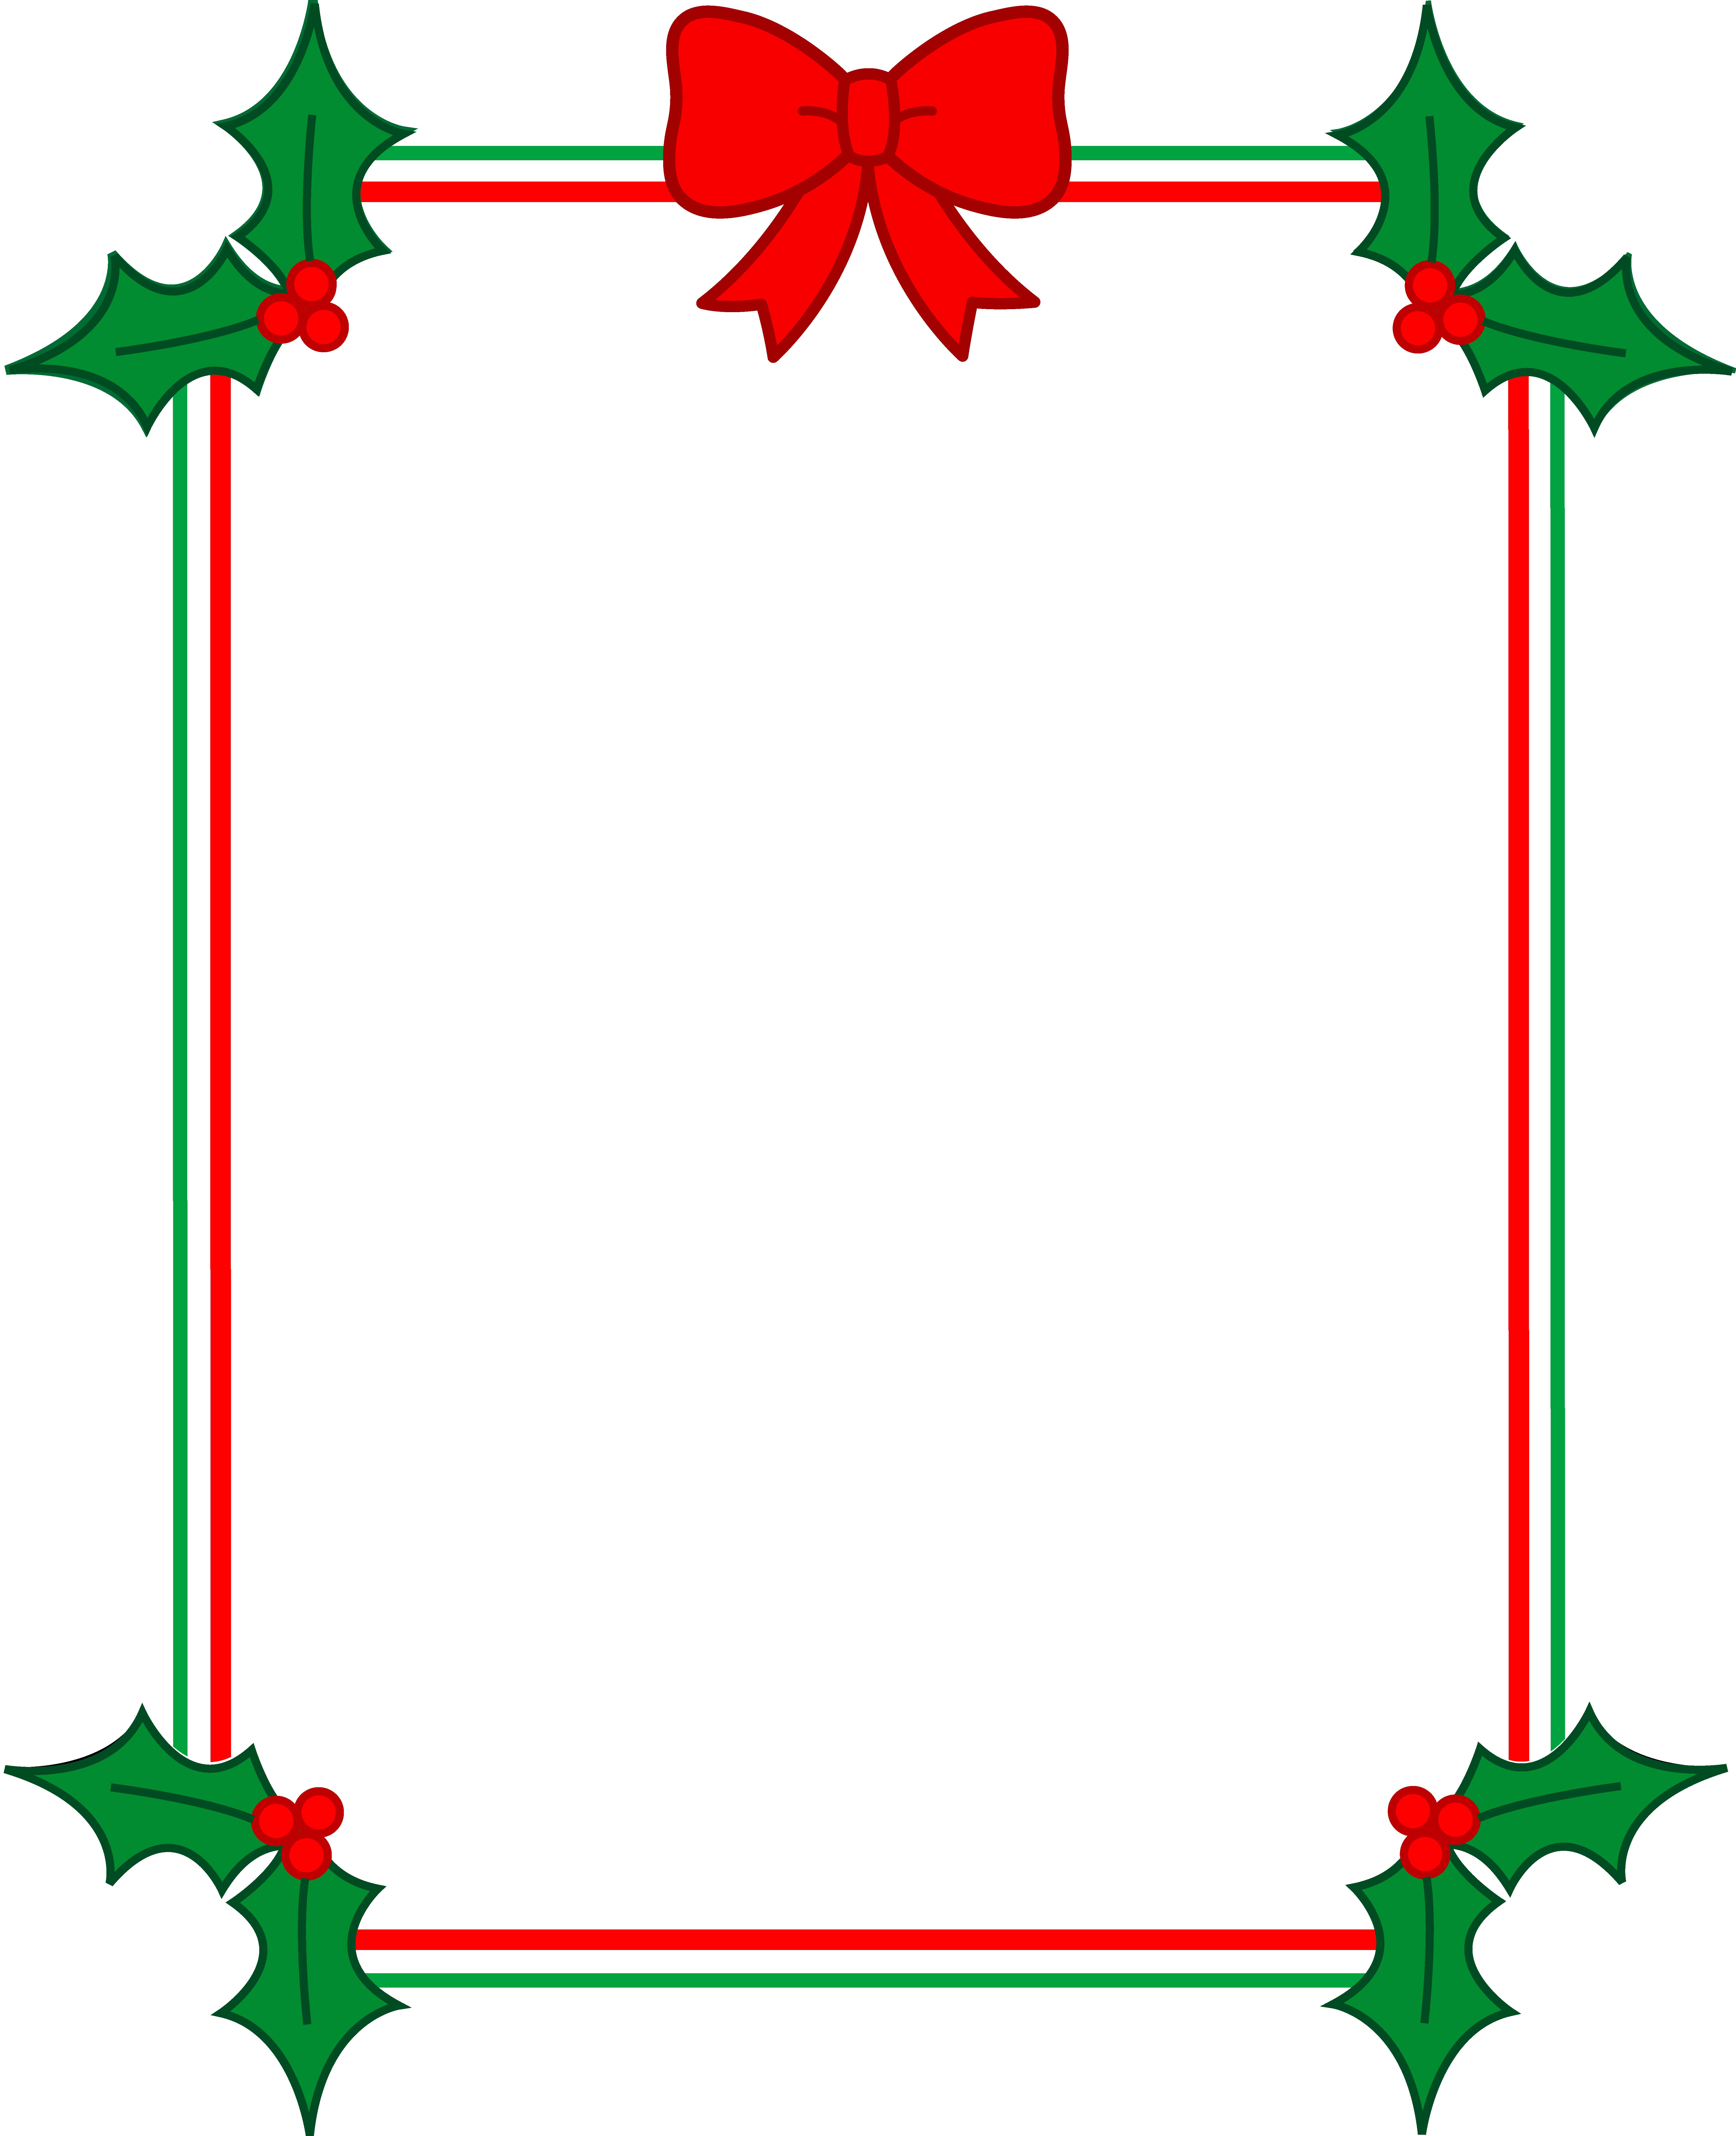 Free Christmas Borders Free Christmas Borders Christmas Graphics Free Christmas Border